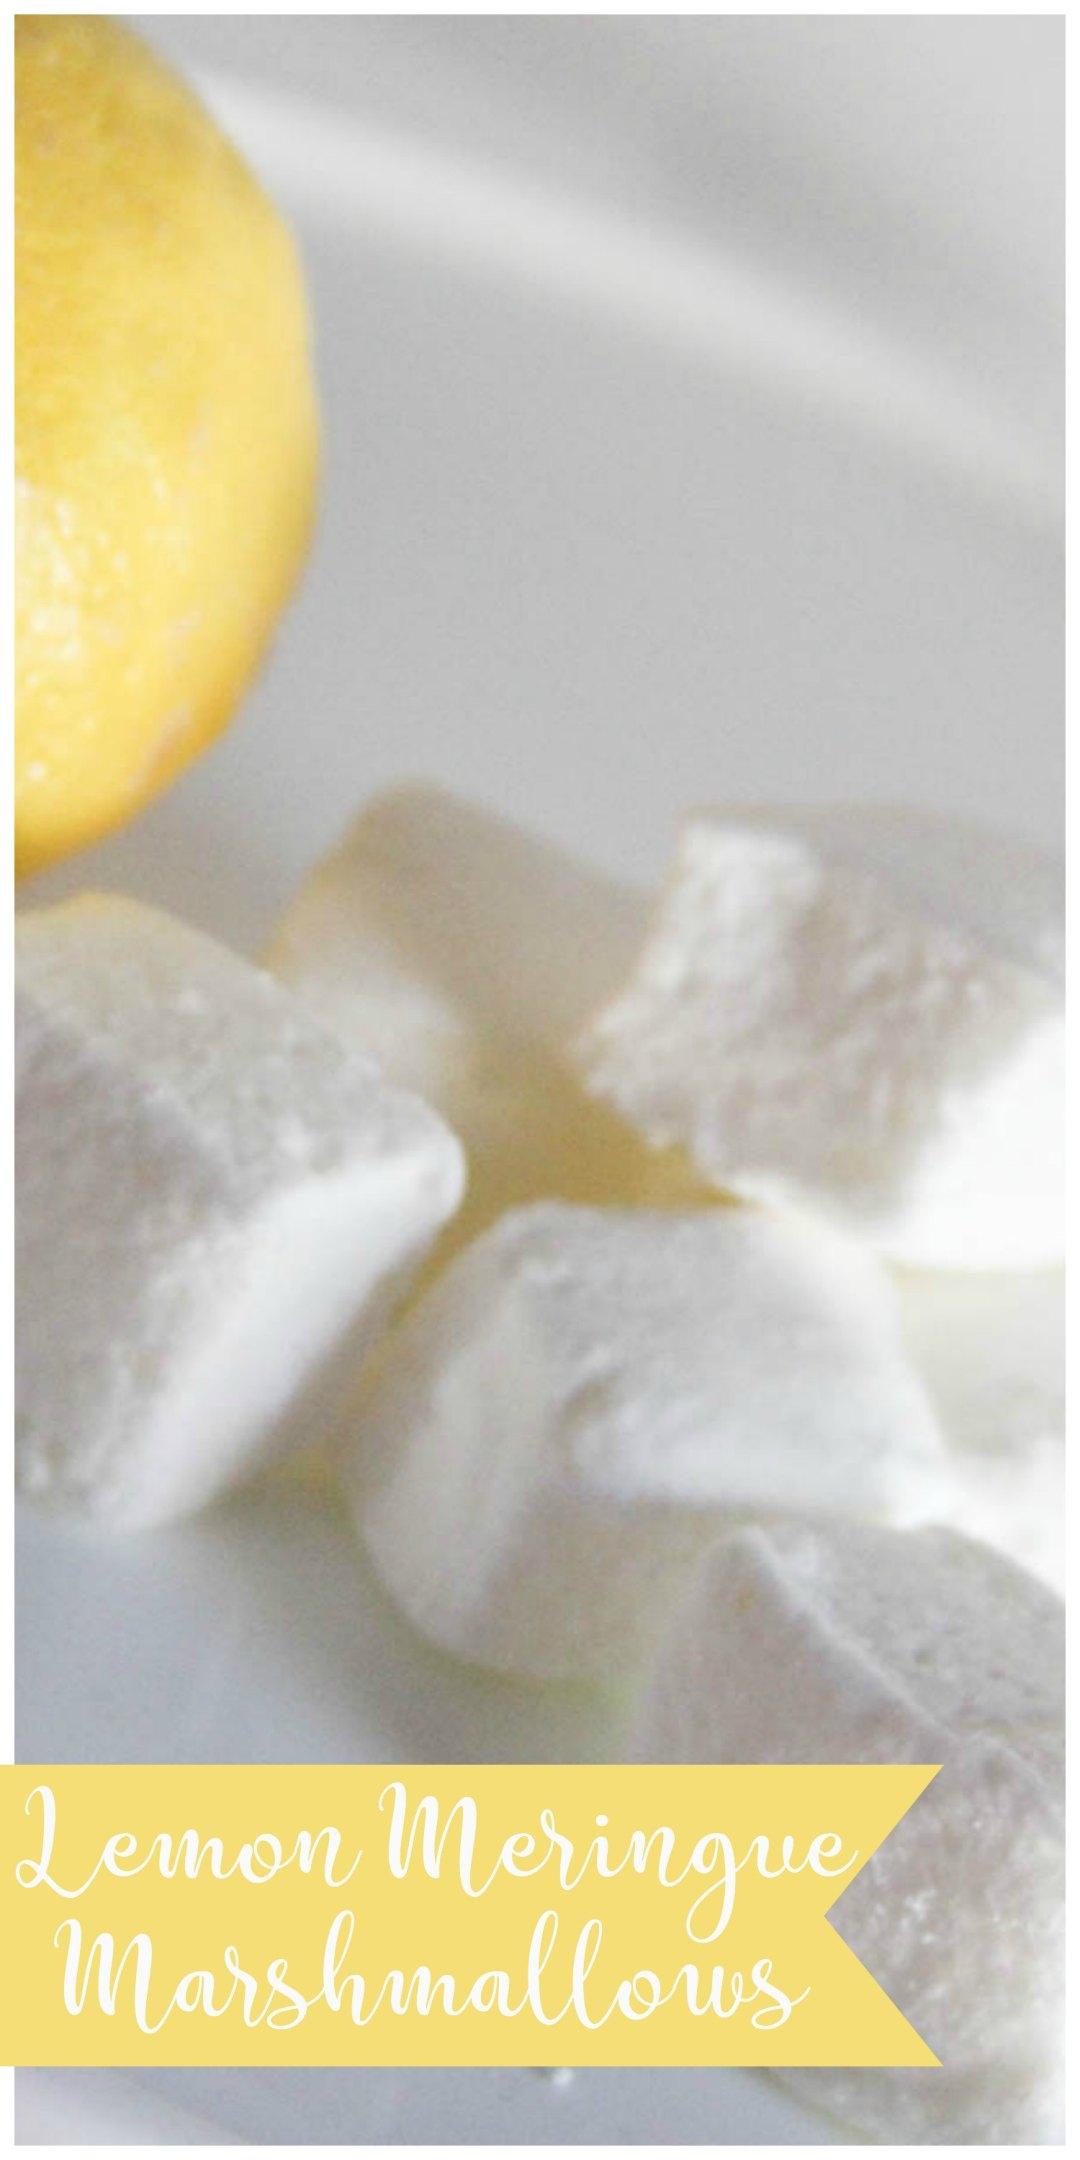 Everyday Party Magazine Lemon Meringue Marshmallows #Marshmallow #LemonMeringue #Recipe